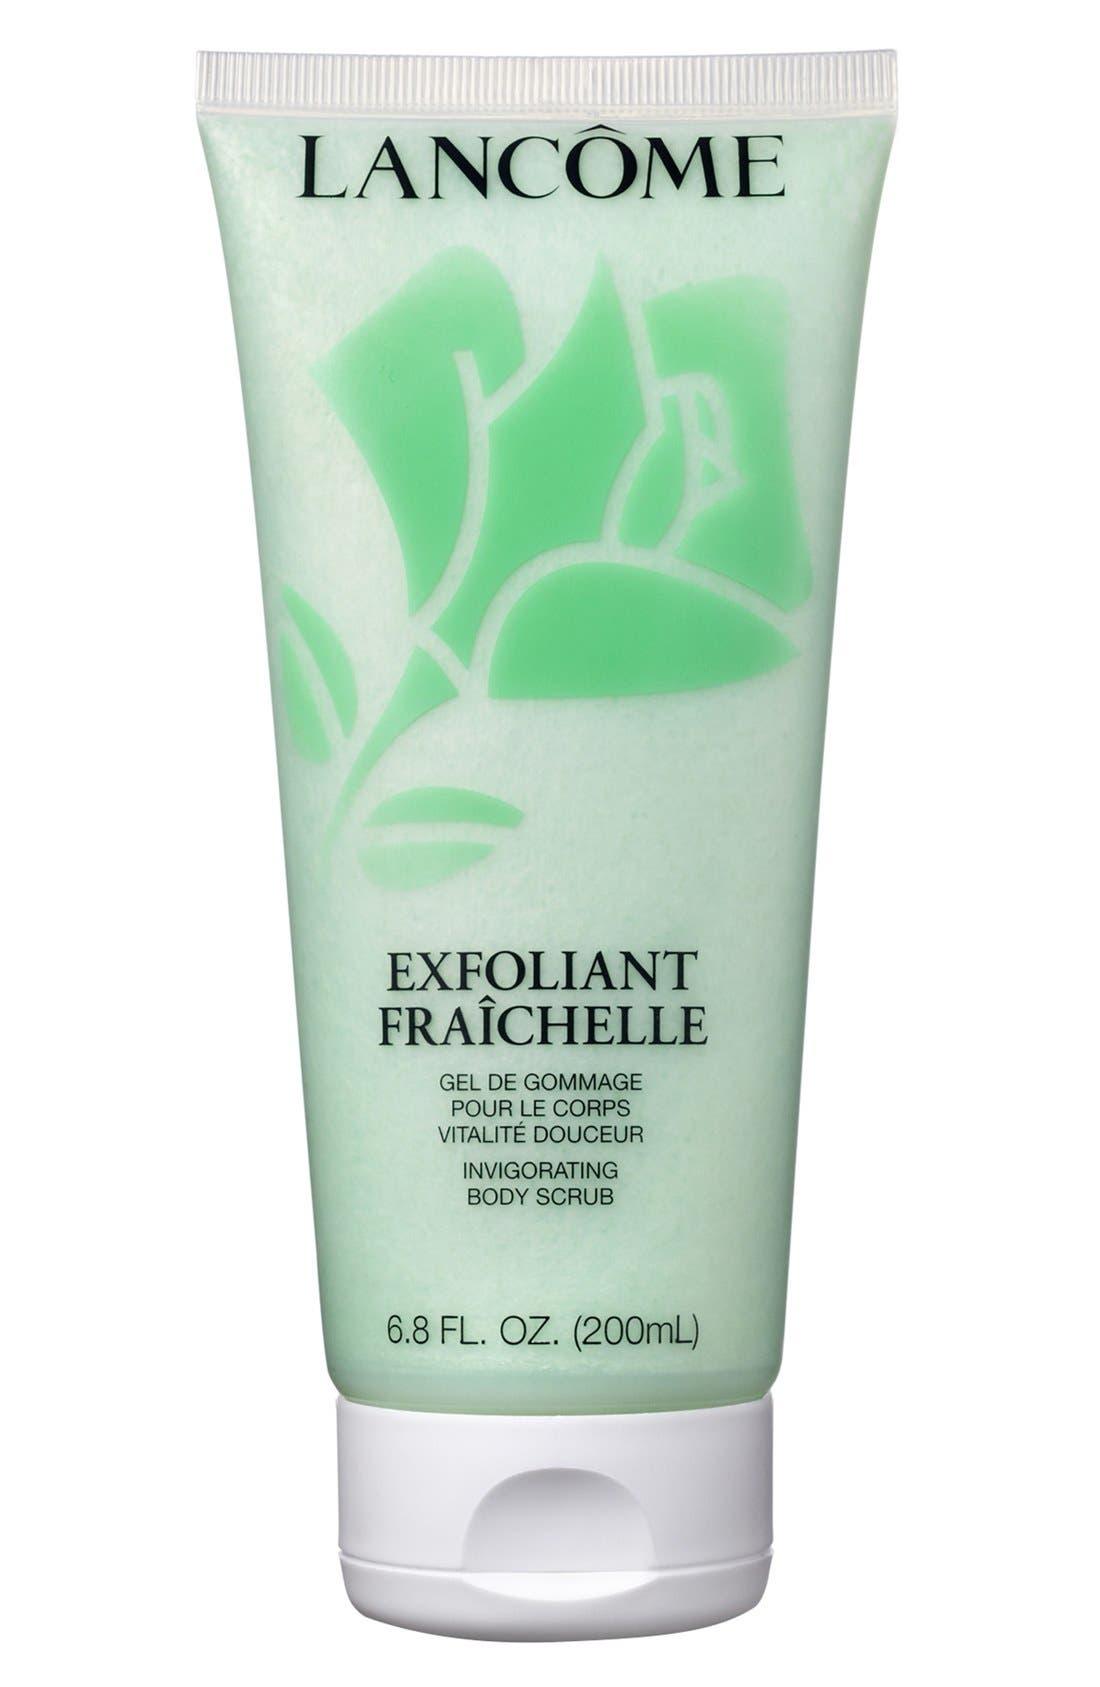 LANCÔME 'Exfoliant Fraîchelle' Invigorating Body Scrub, Main, color, 000